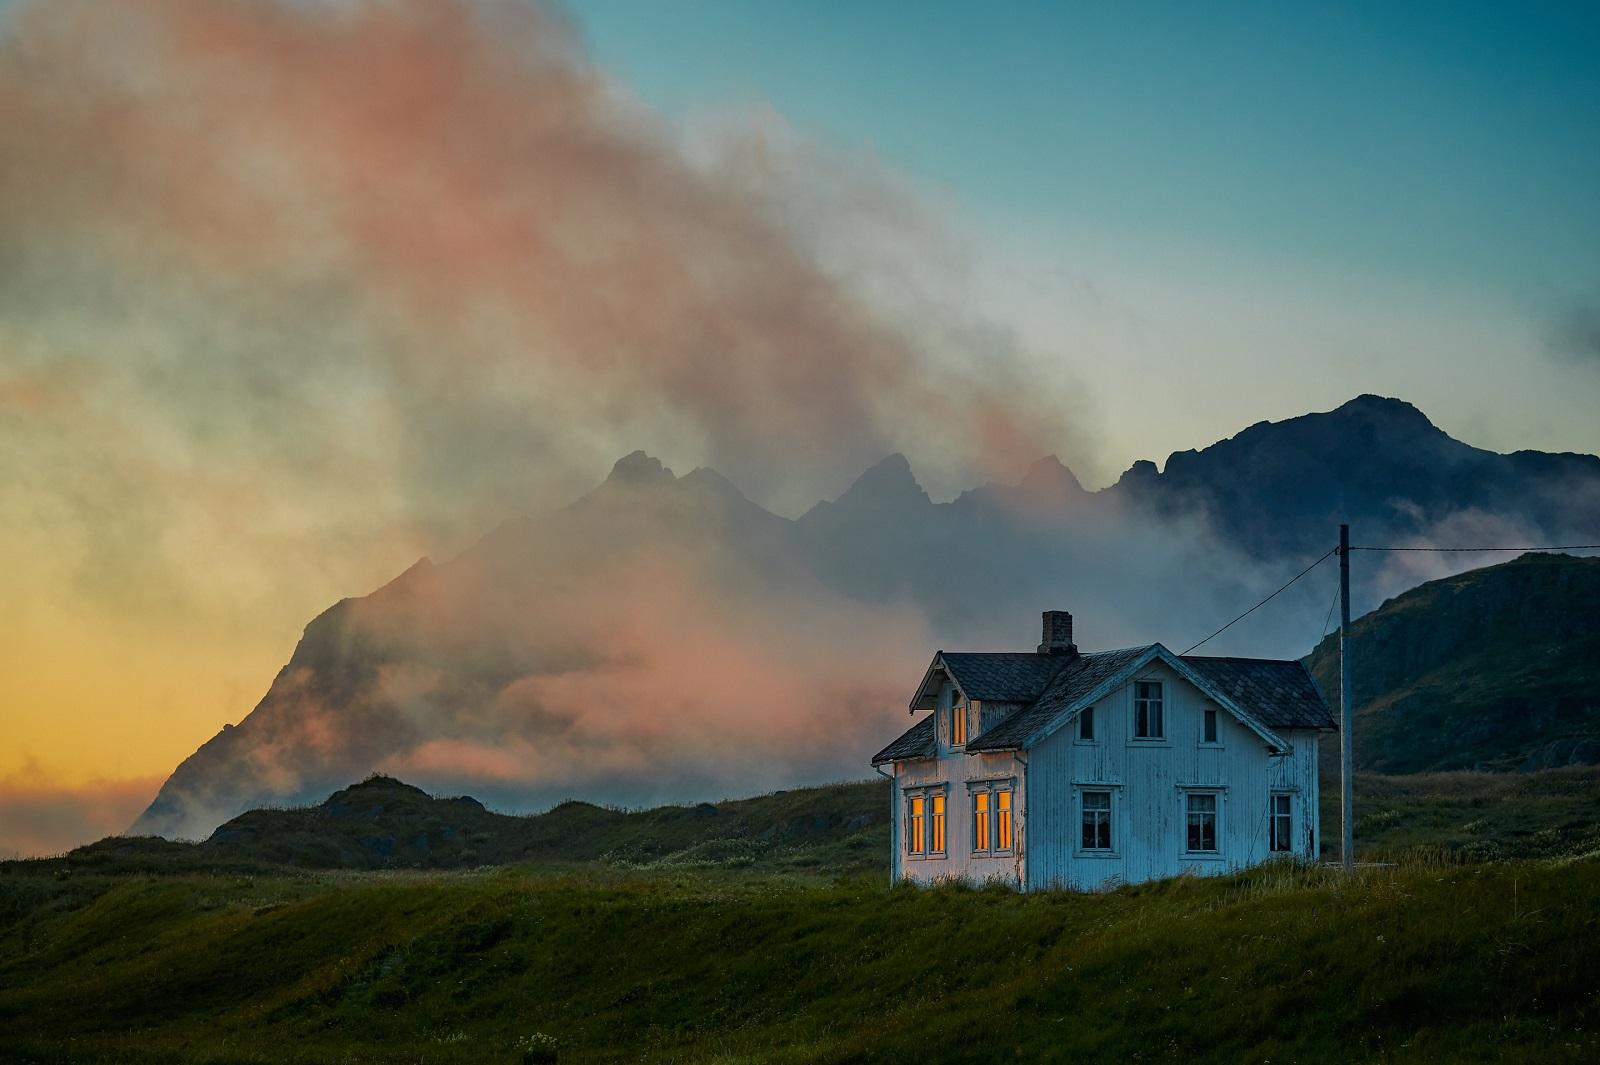 Airbnb zniżka - kupon na start rabat kod rabatowy 100 zł